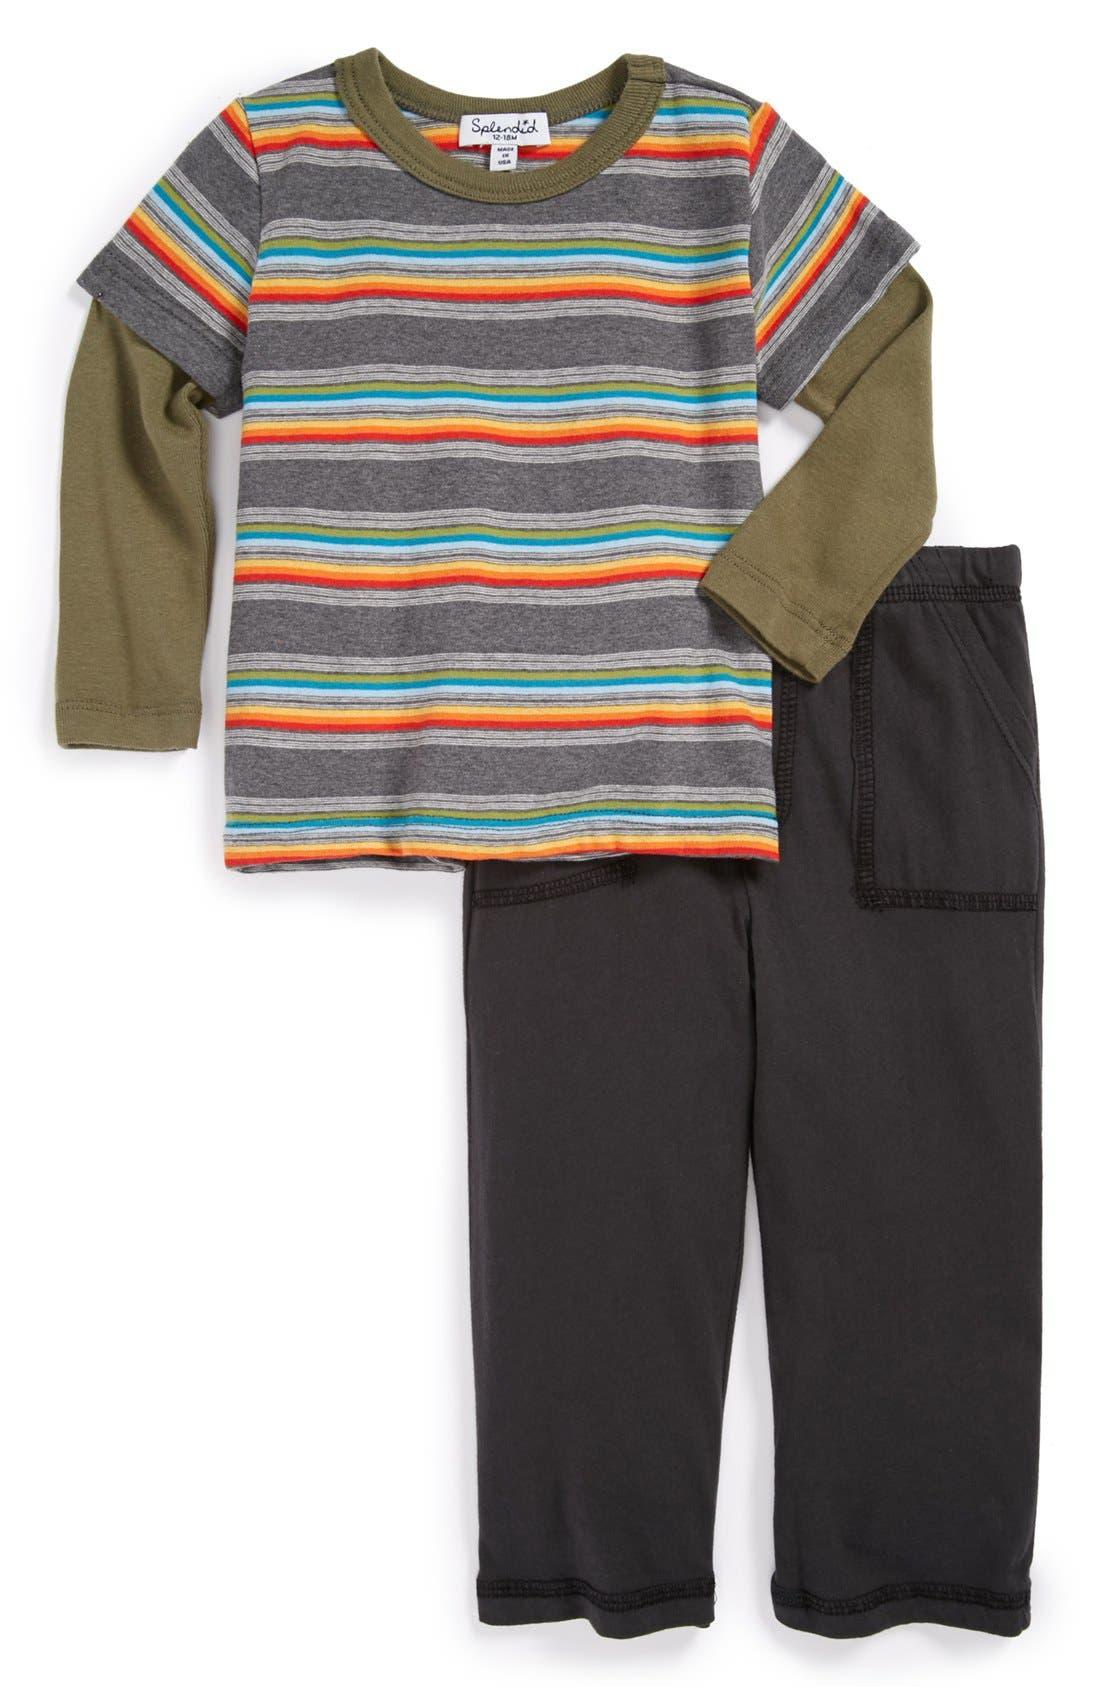 Main Image - Splendid 'Twofer' Top & Pants (Baby)